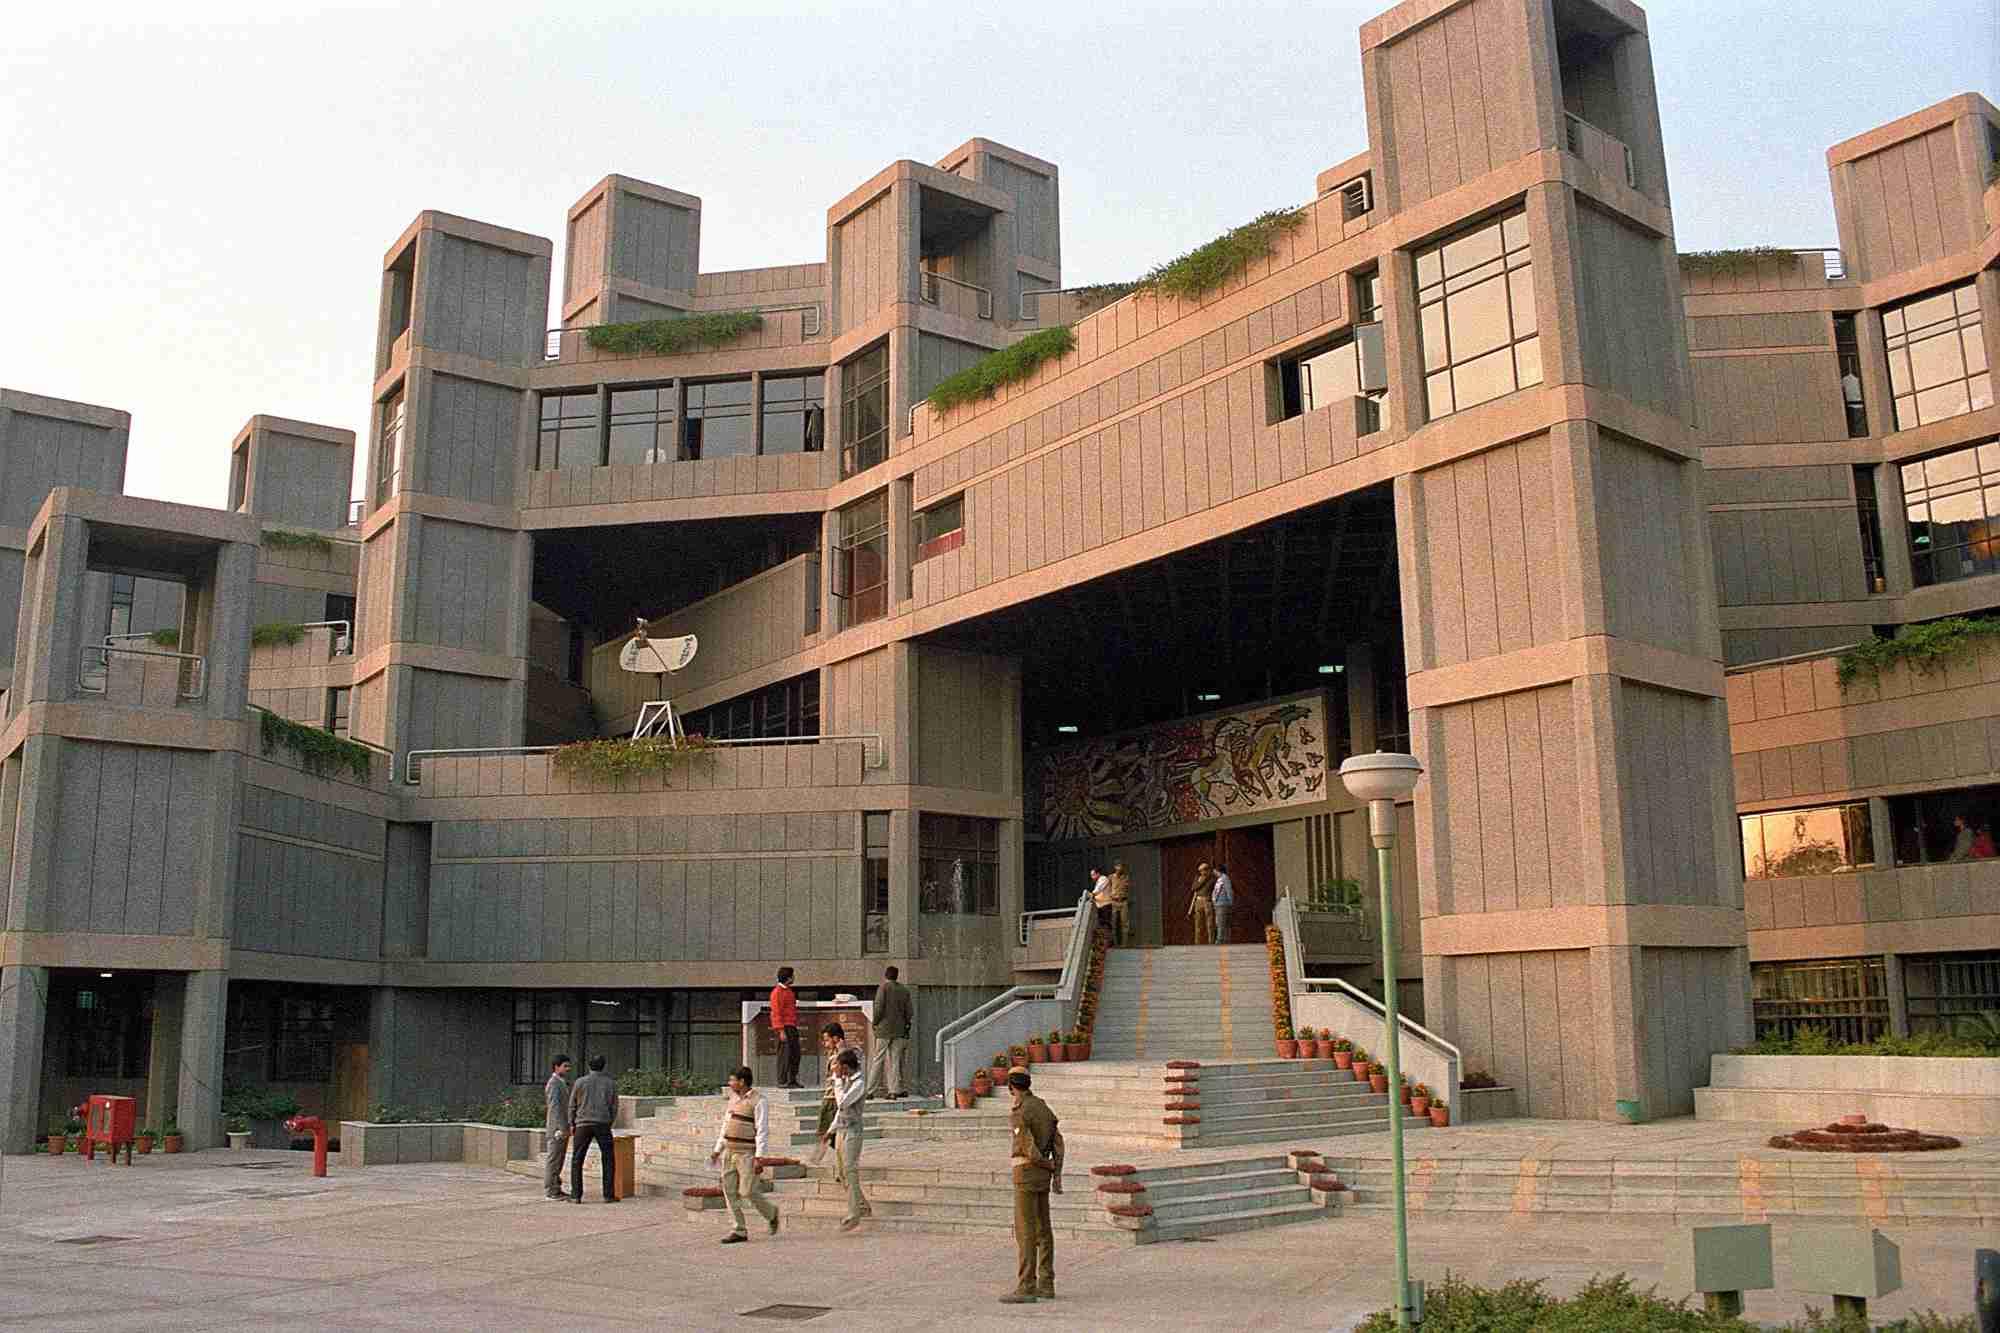 National Science Center entrance